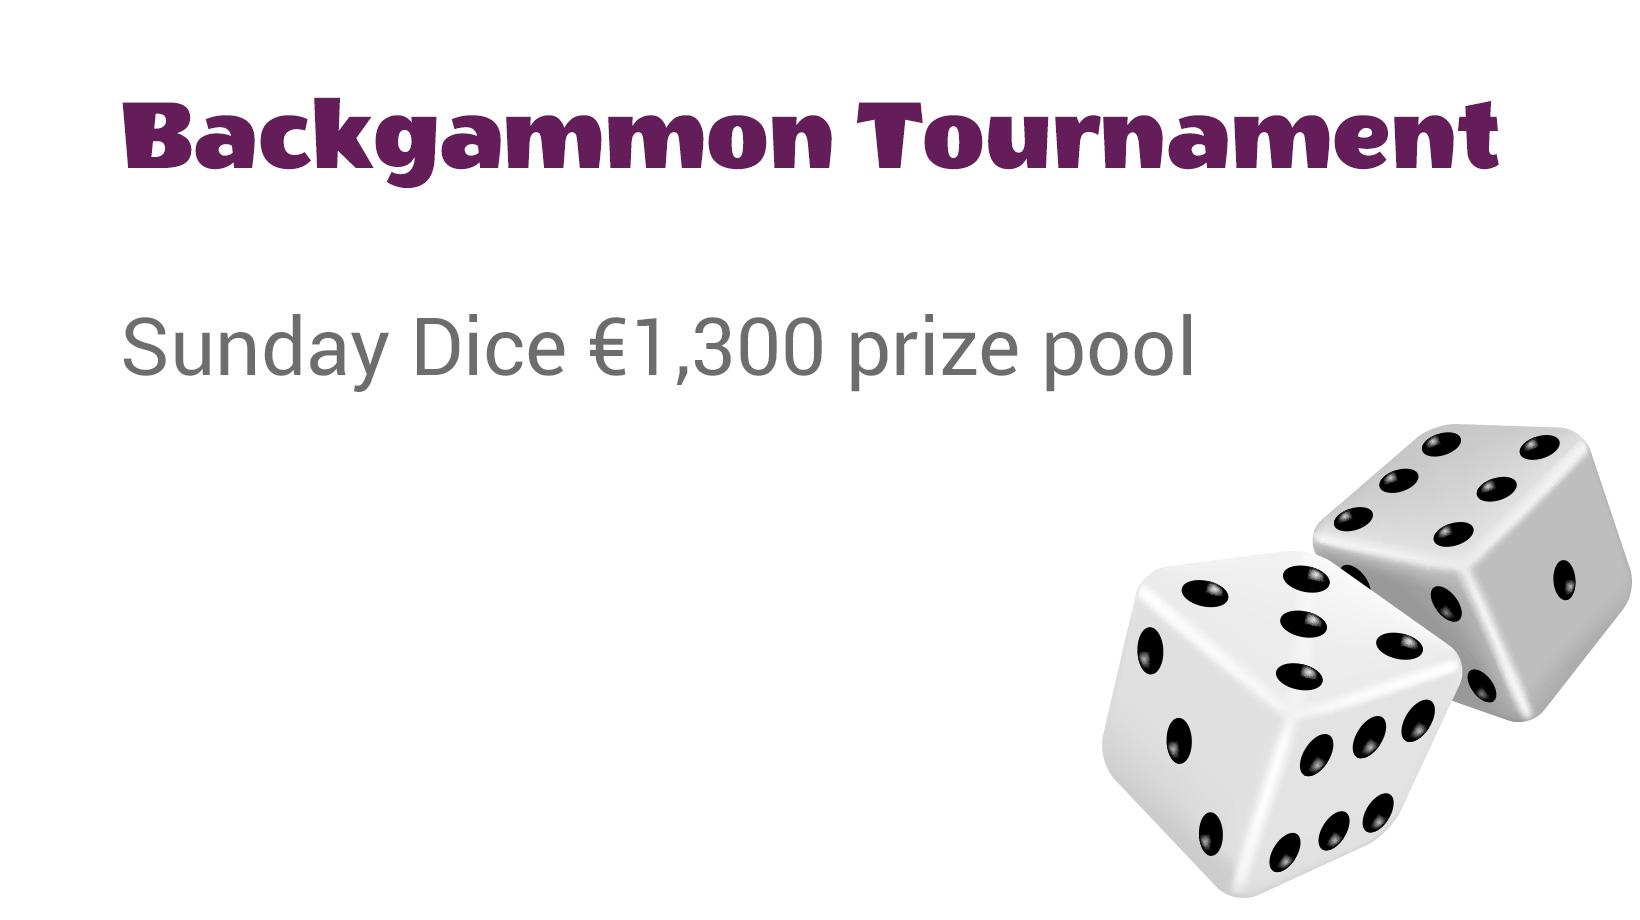 Backgammon Tournament - Sunday Dice